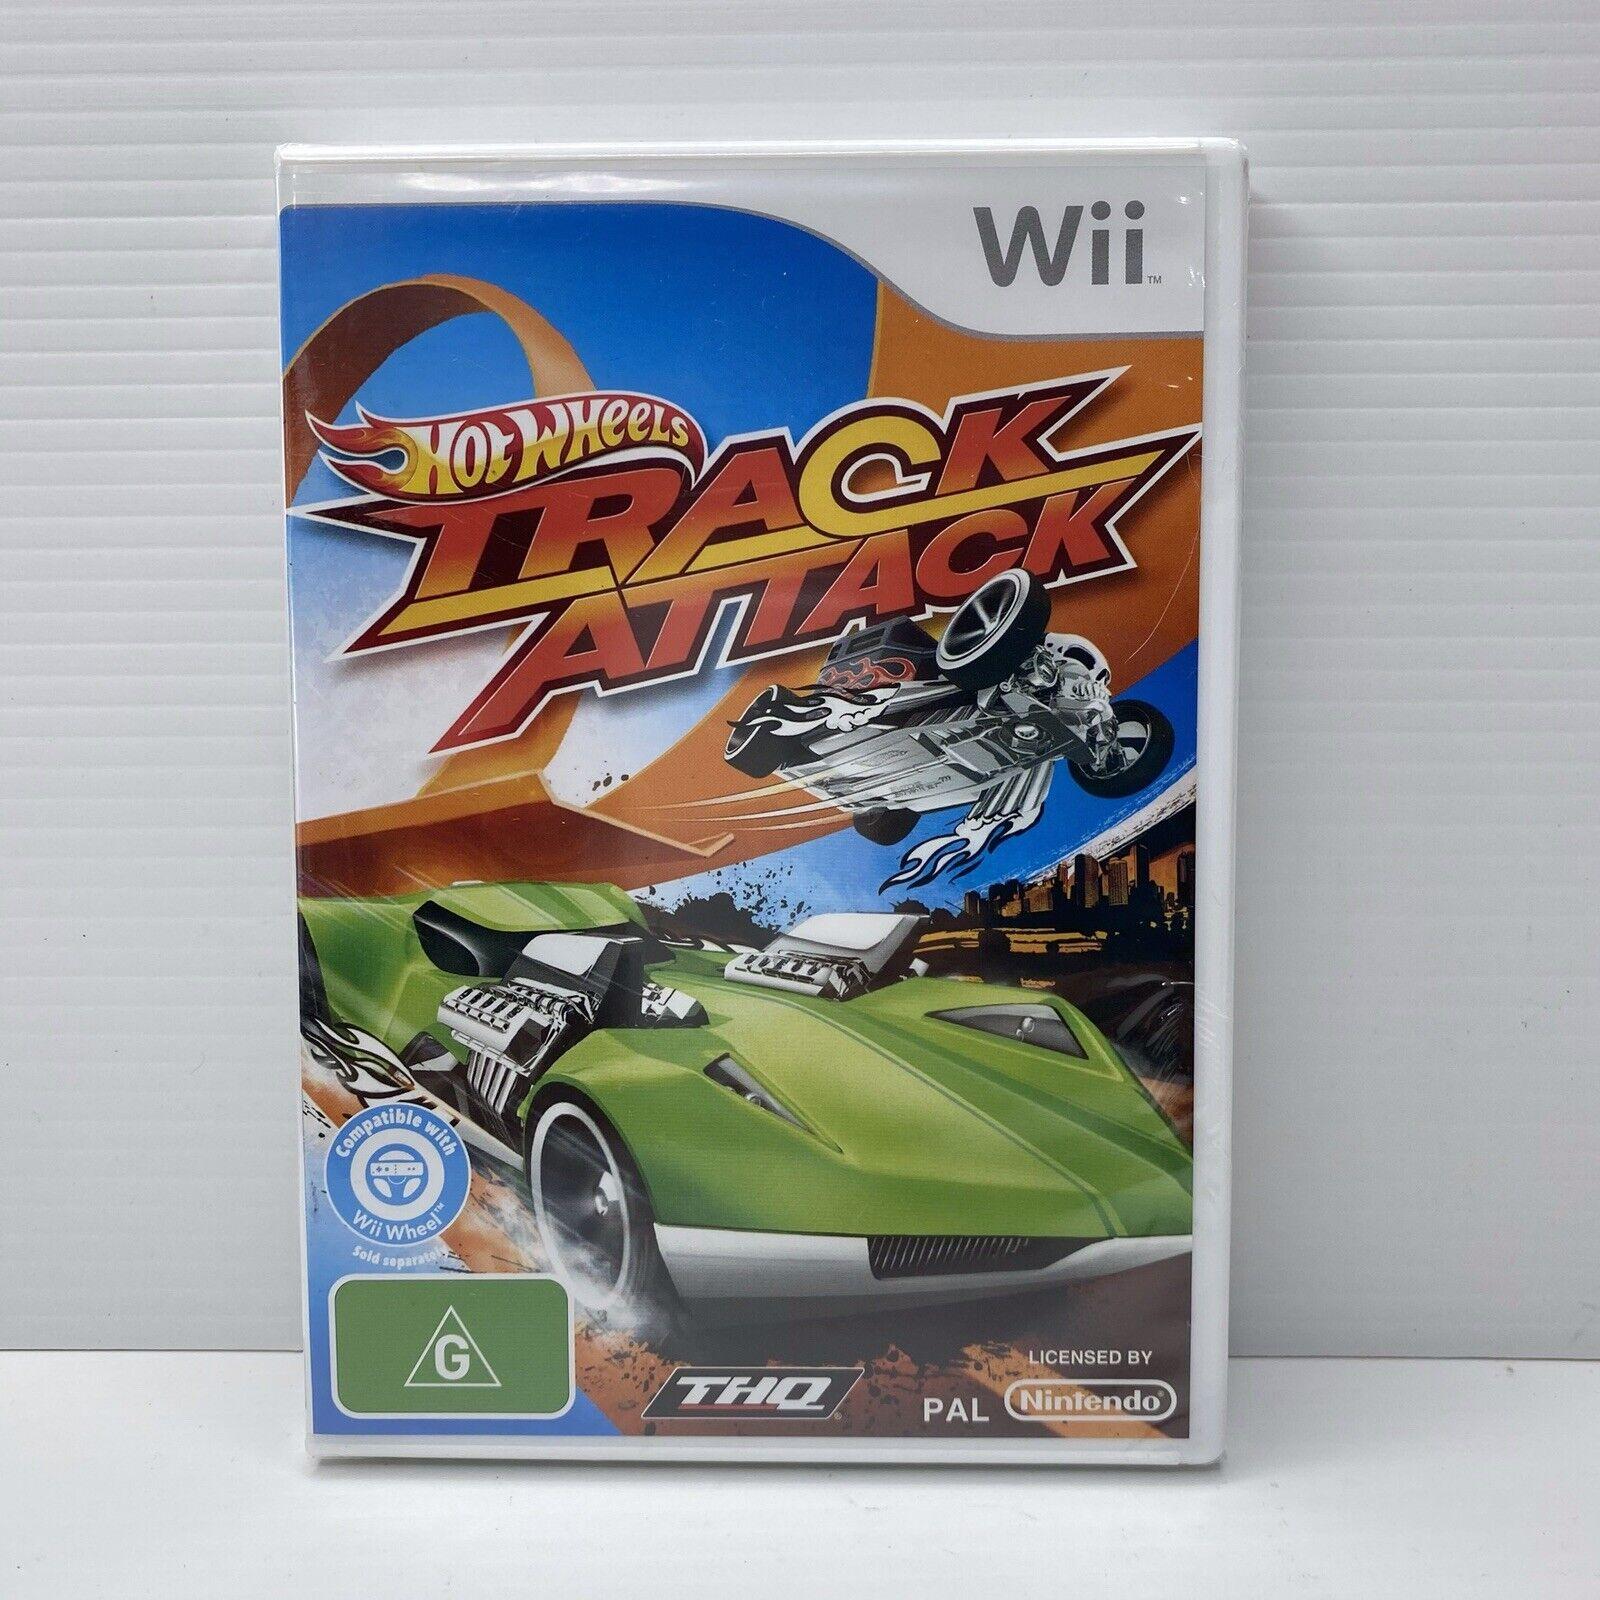 Hot Wheels Track Attack For Nintendo Wii Australian Pal Version For Sale Online Ebay